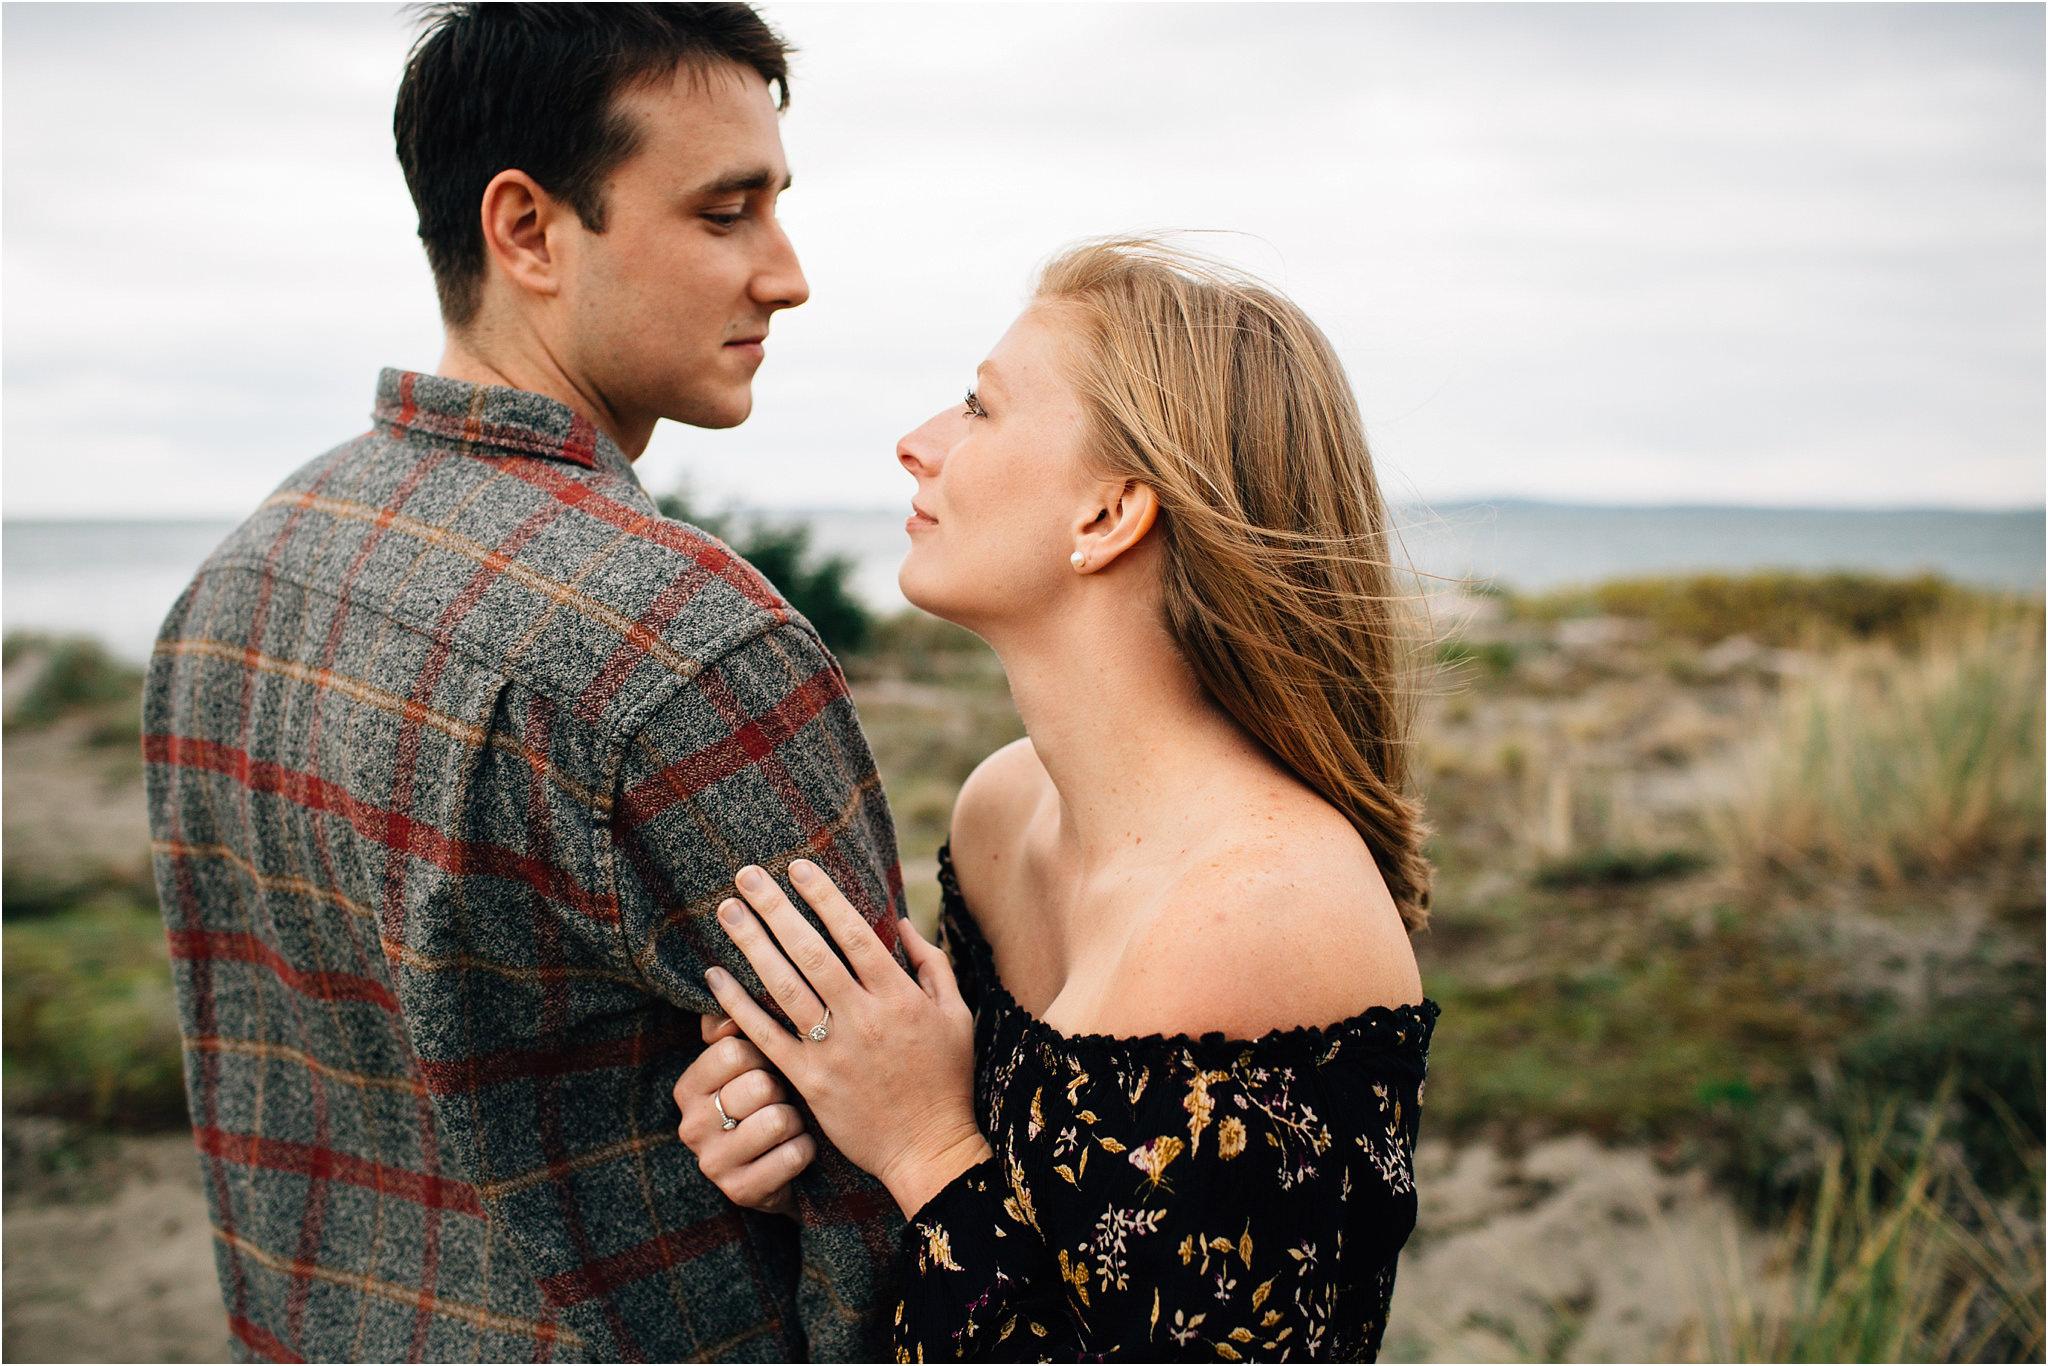 oak-harbor-couples-photographer-deception-pass-22.jpg